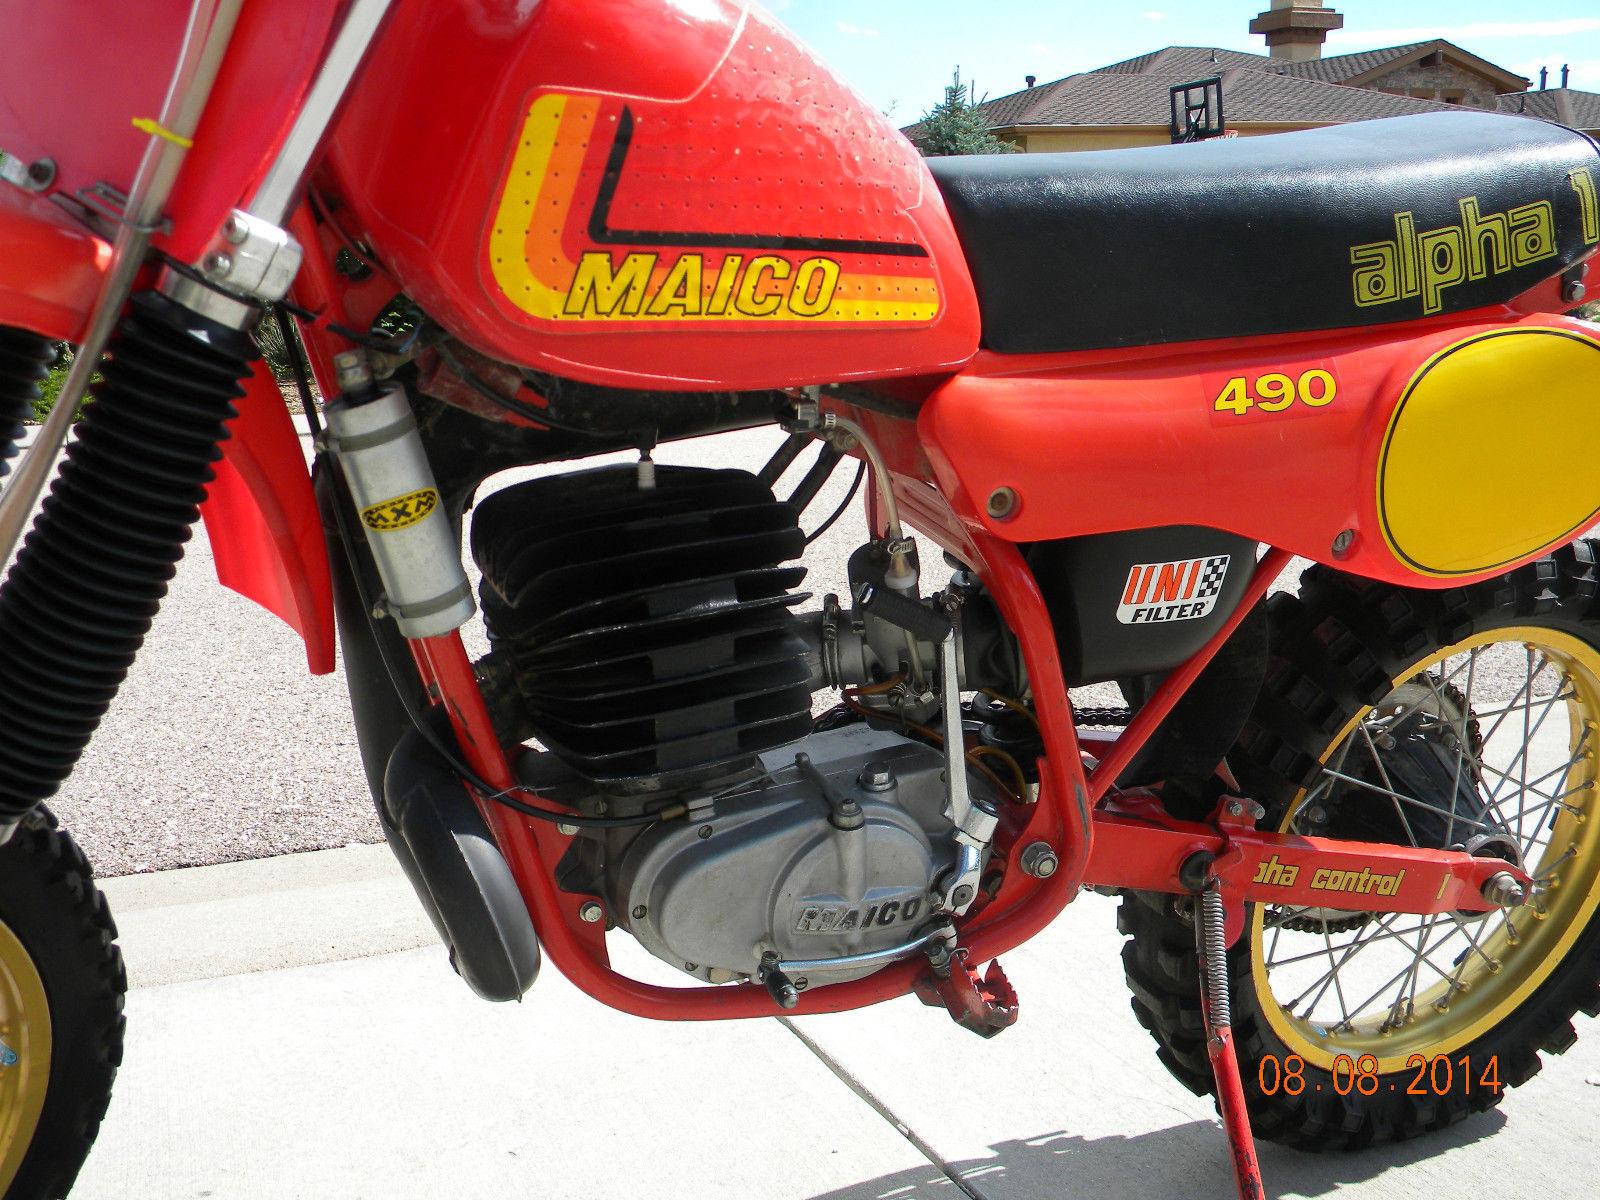 Https Top Alaska Day 14 2014 08 10t2120 Diagram Of Suzuki Motorcycle Parts 1975 Re5 Engine Mounting Maico Alpha 1